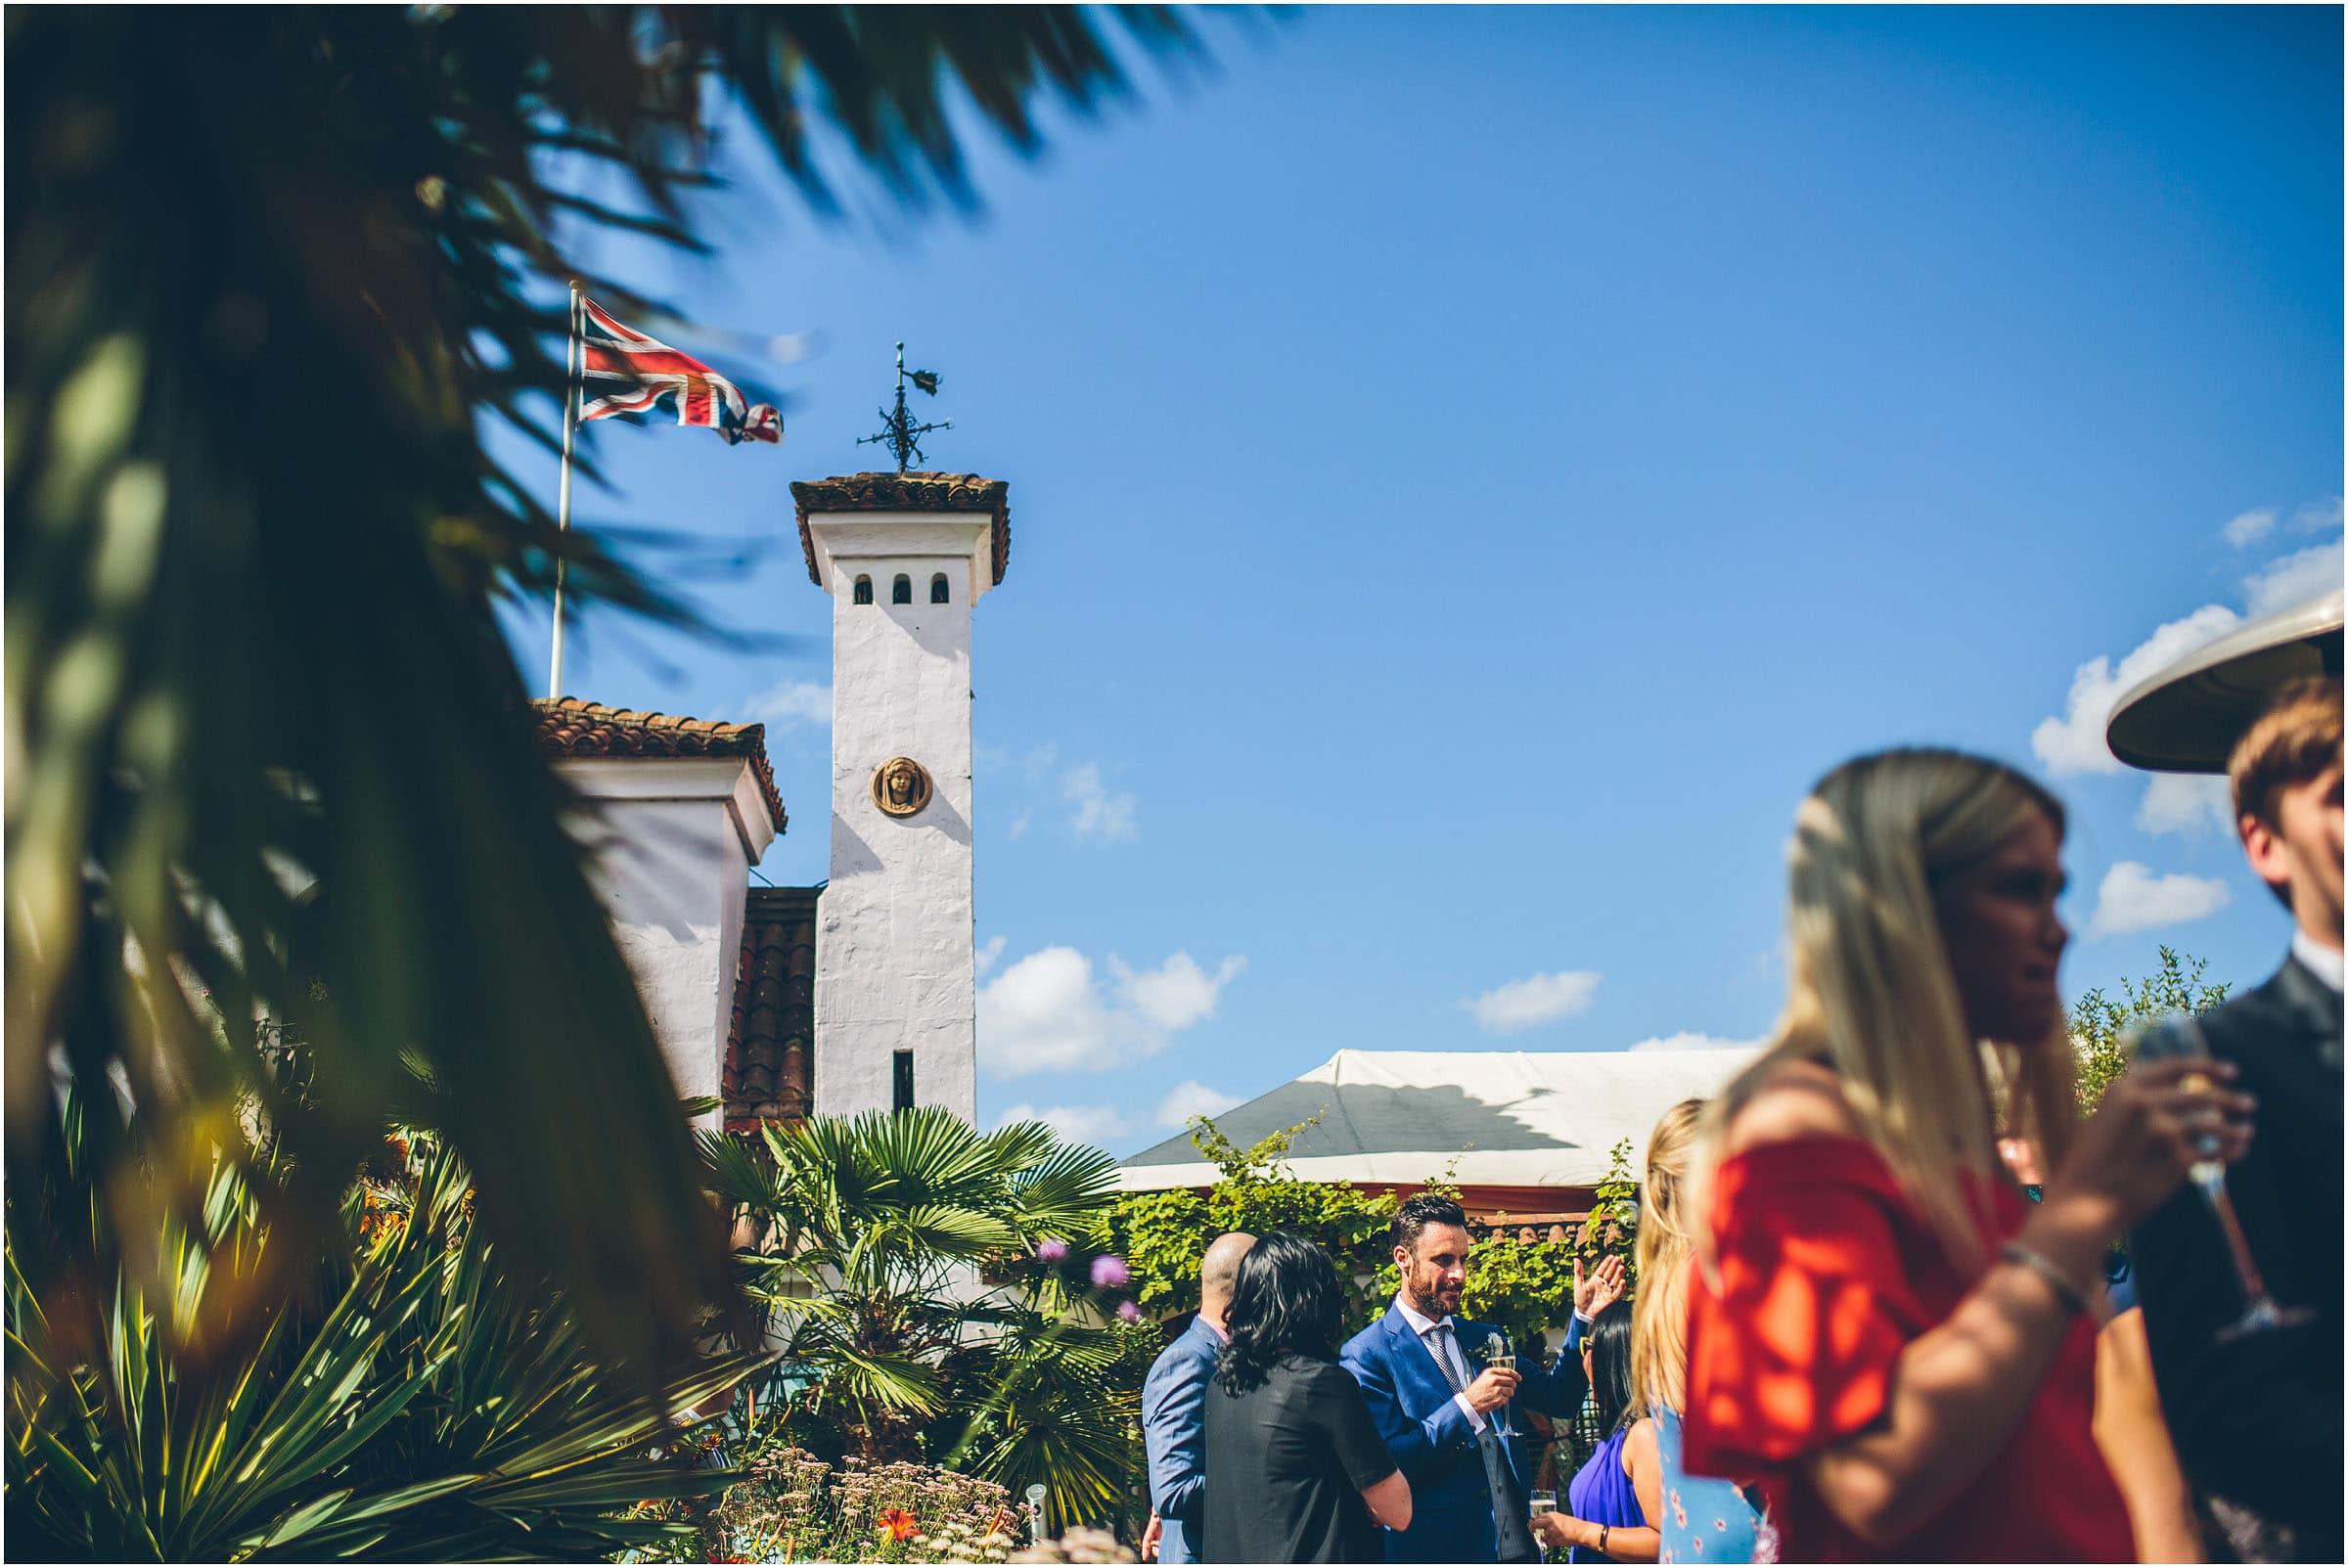 Kensington_Roof_Gardens_Wedding_Photography_0049